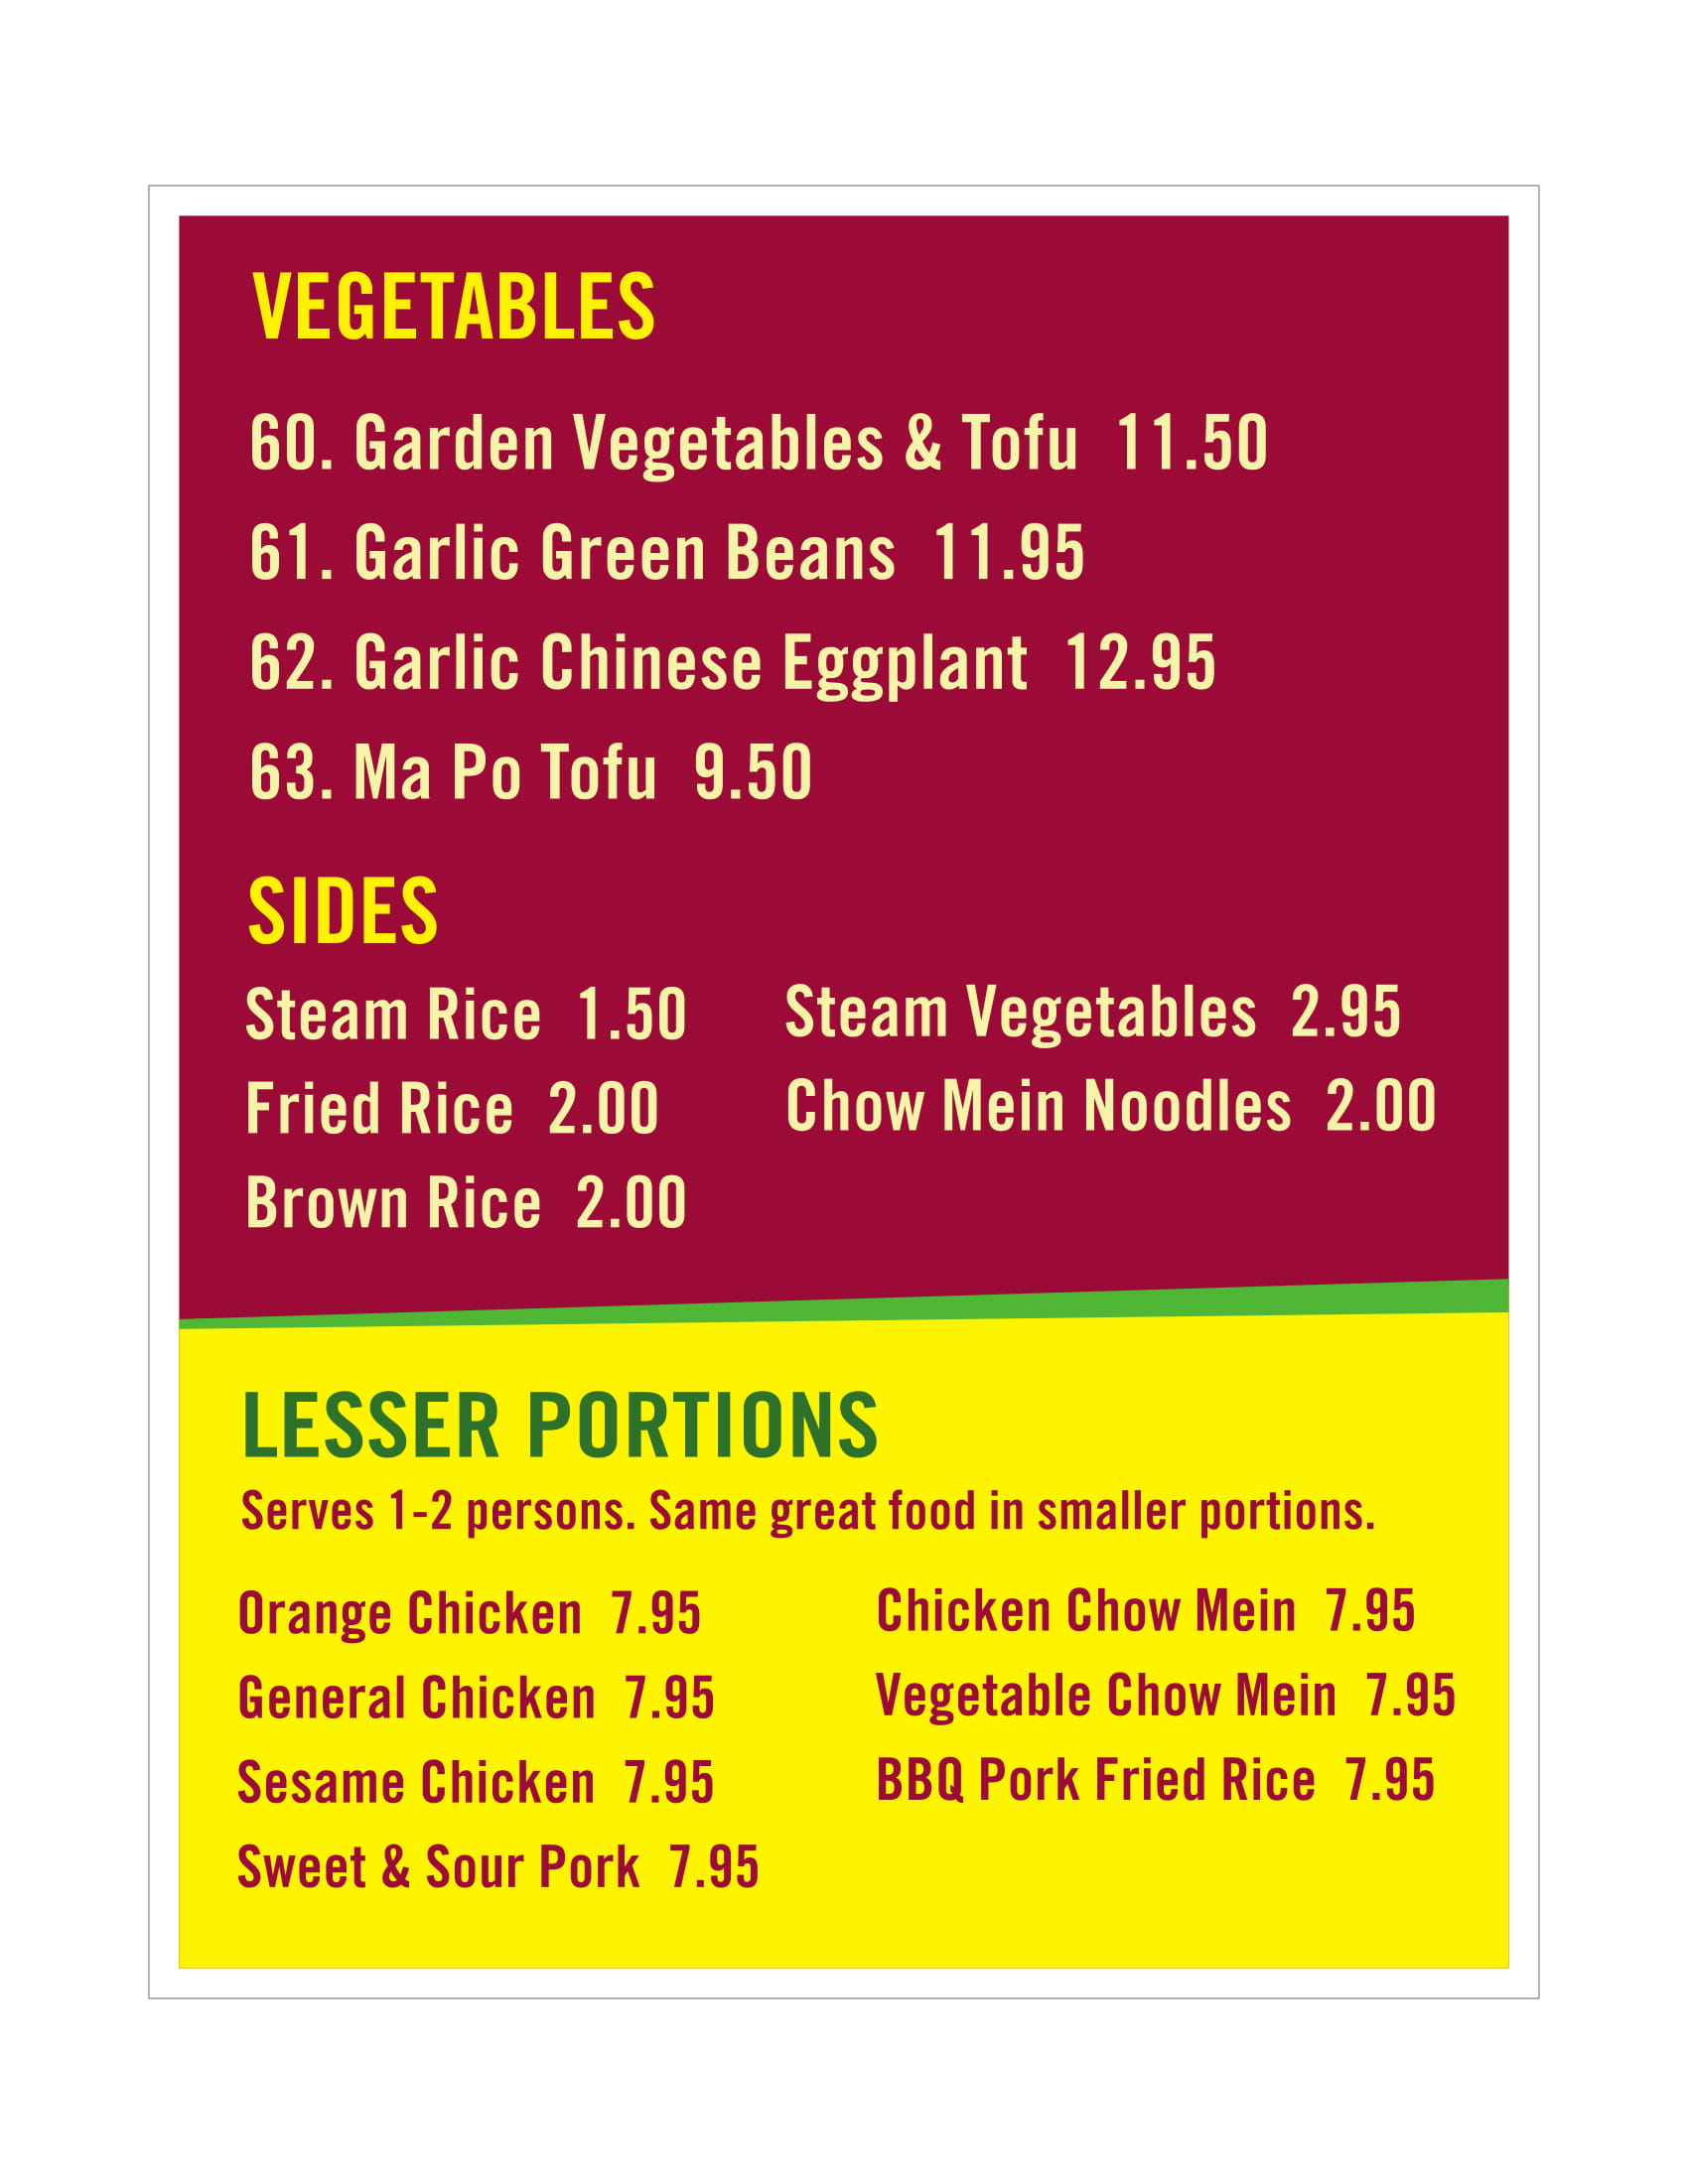 Vegetables-1.jpg